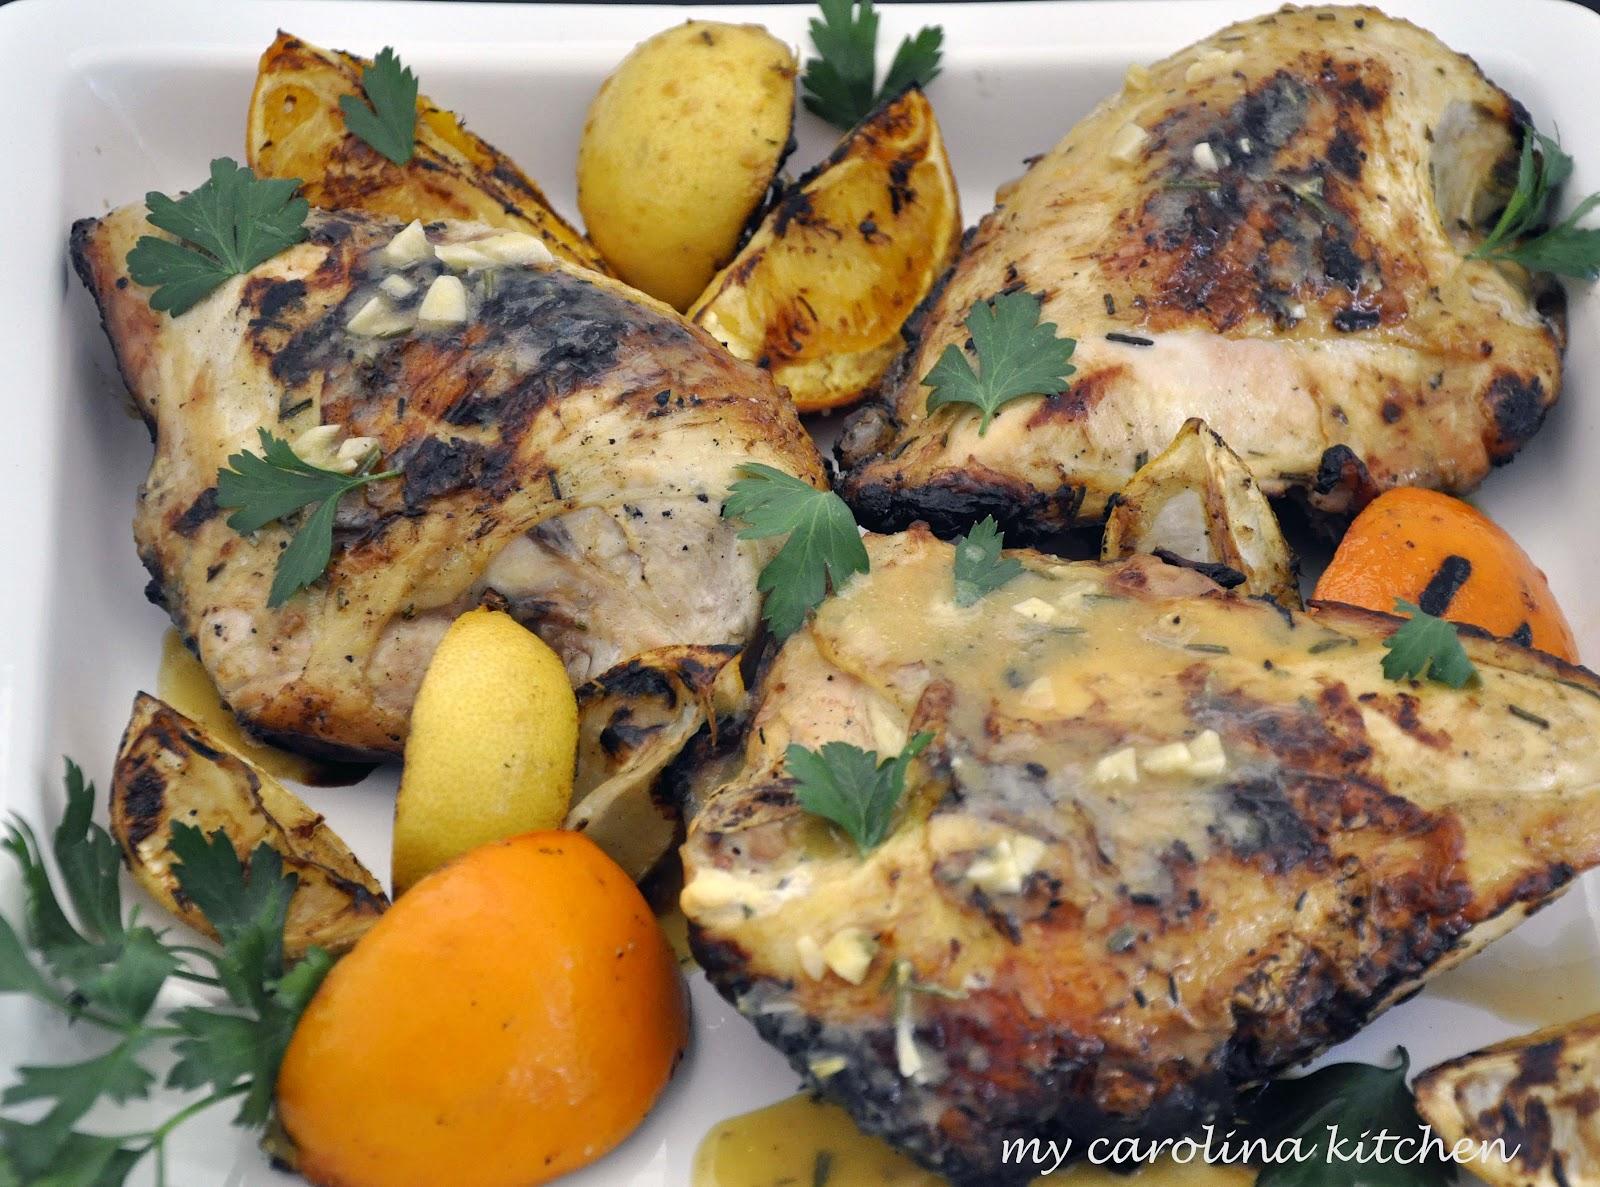 My Carolina Kitchen: Grilled Citrus Chicken Breasts Recipe